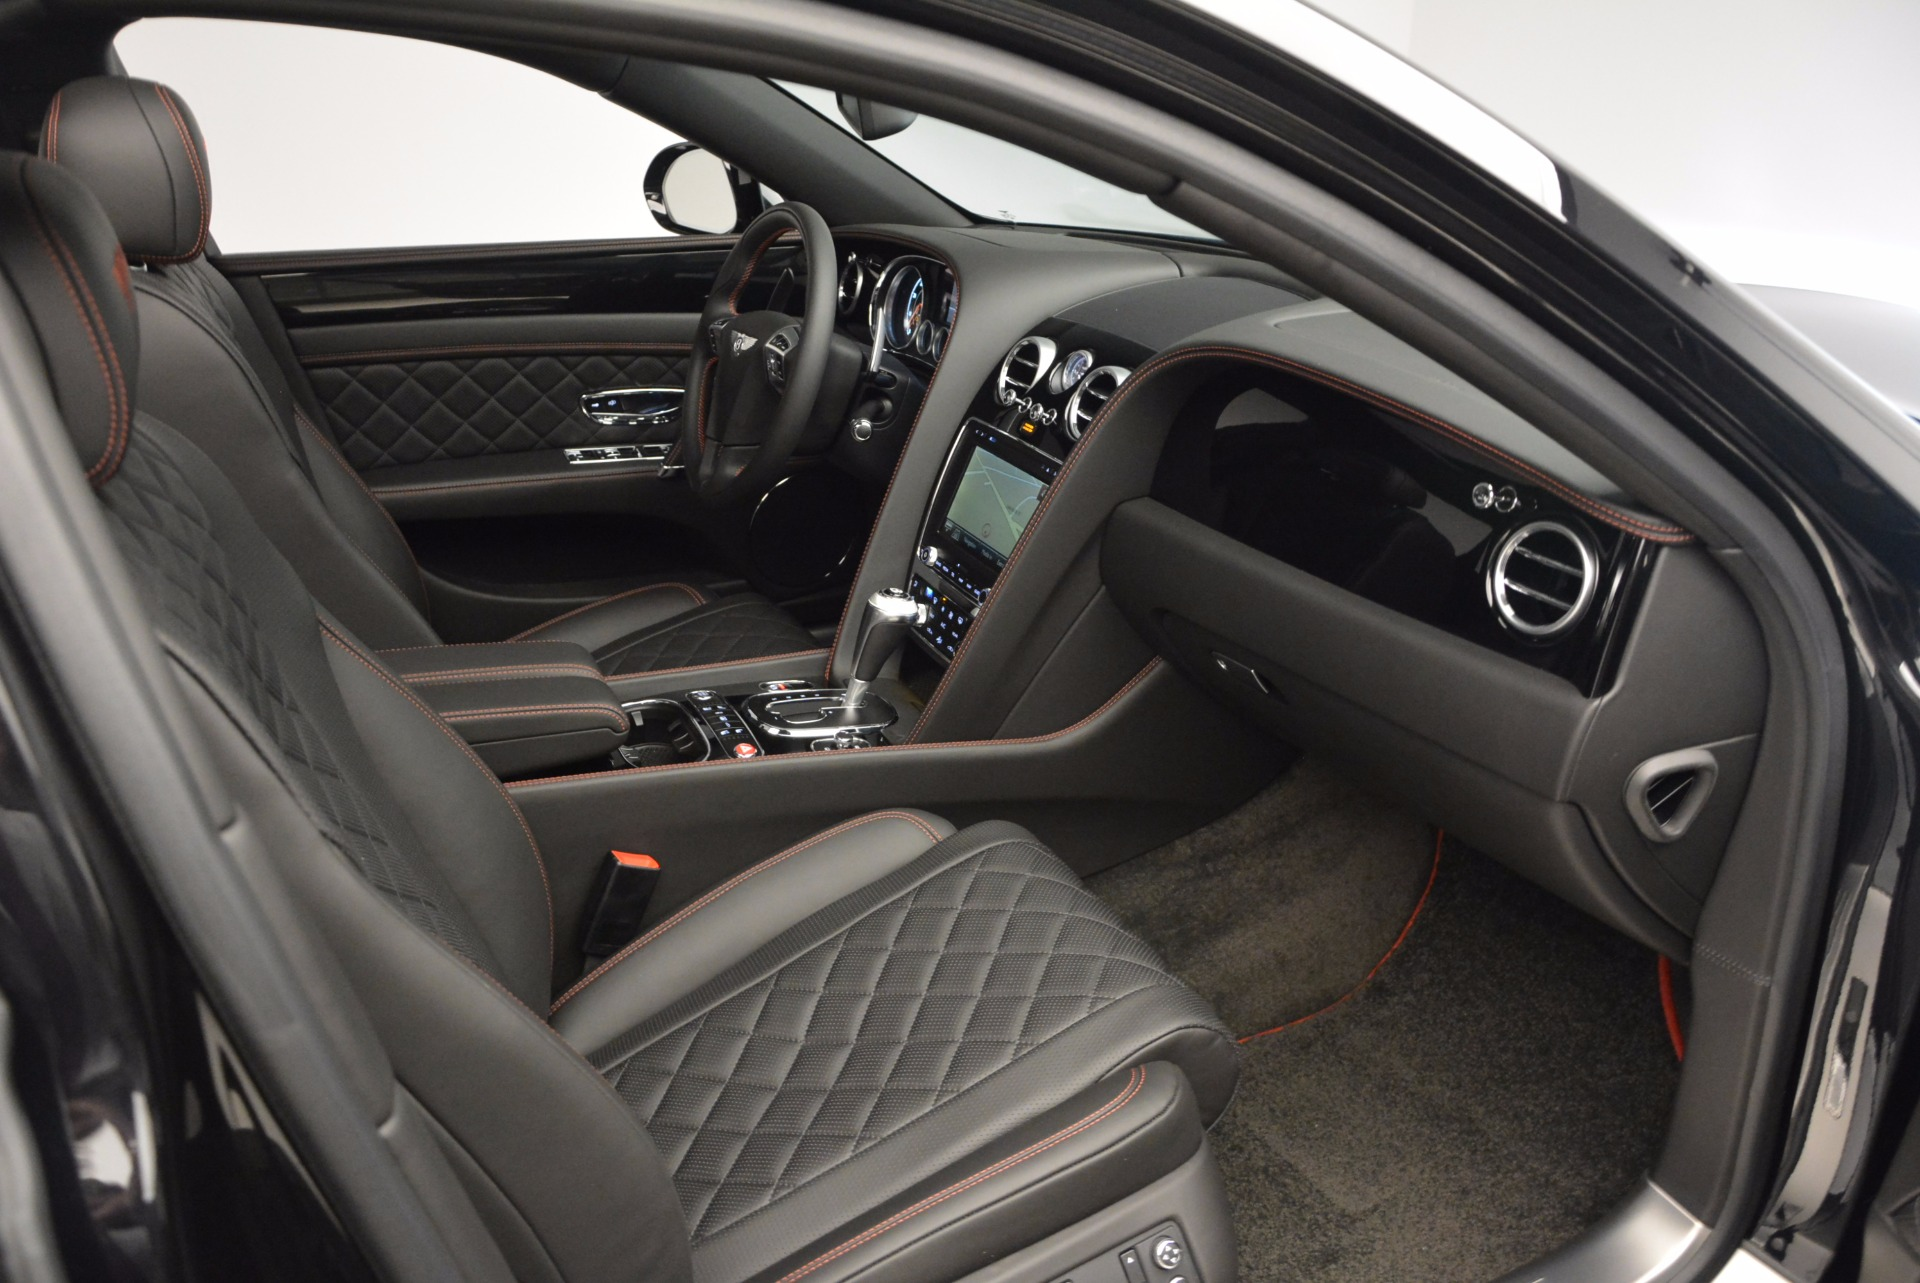 Used 2017 Bentley Flying Spur V8 S For Sale In Westport, CT 732_p26